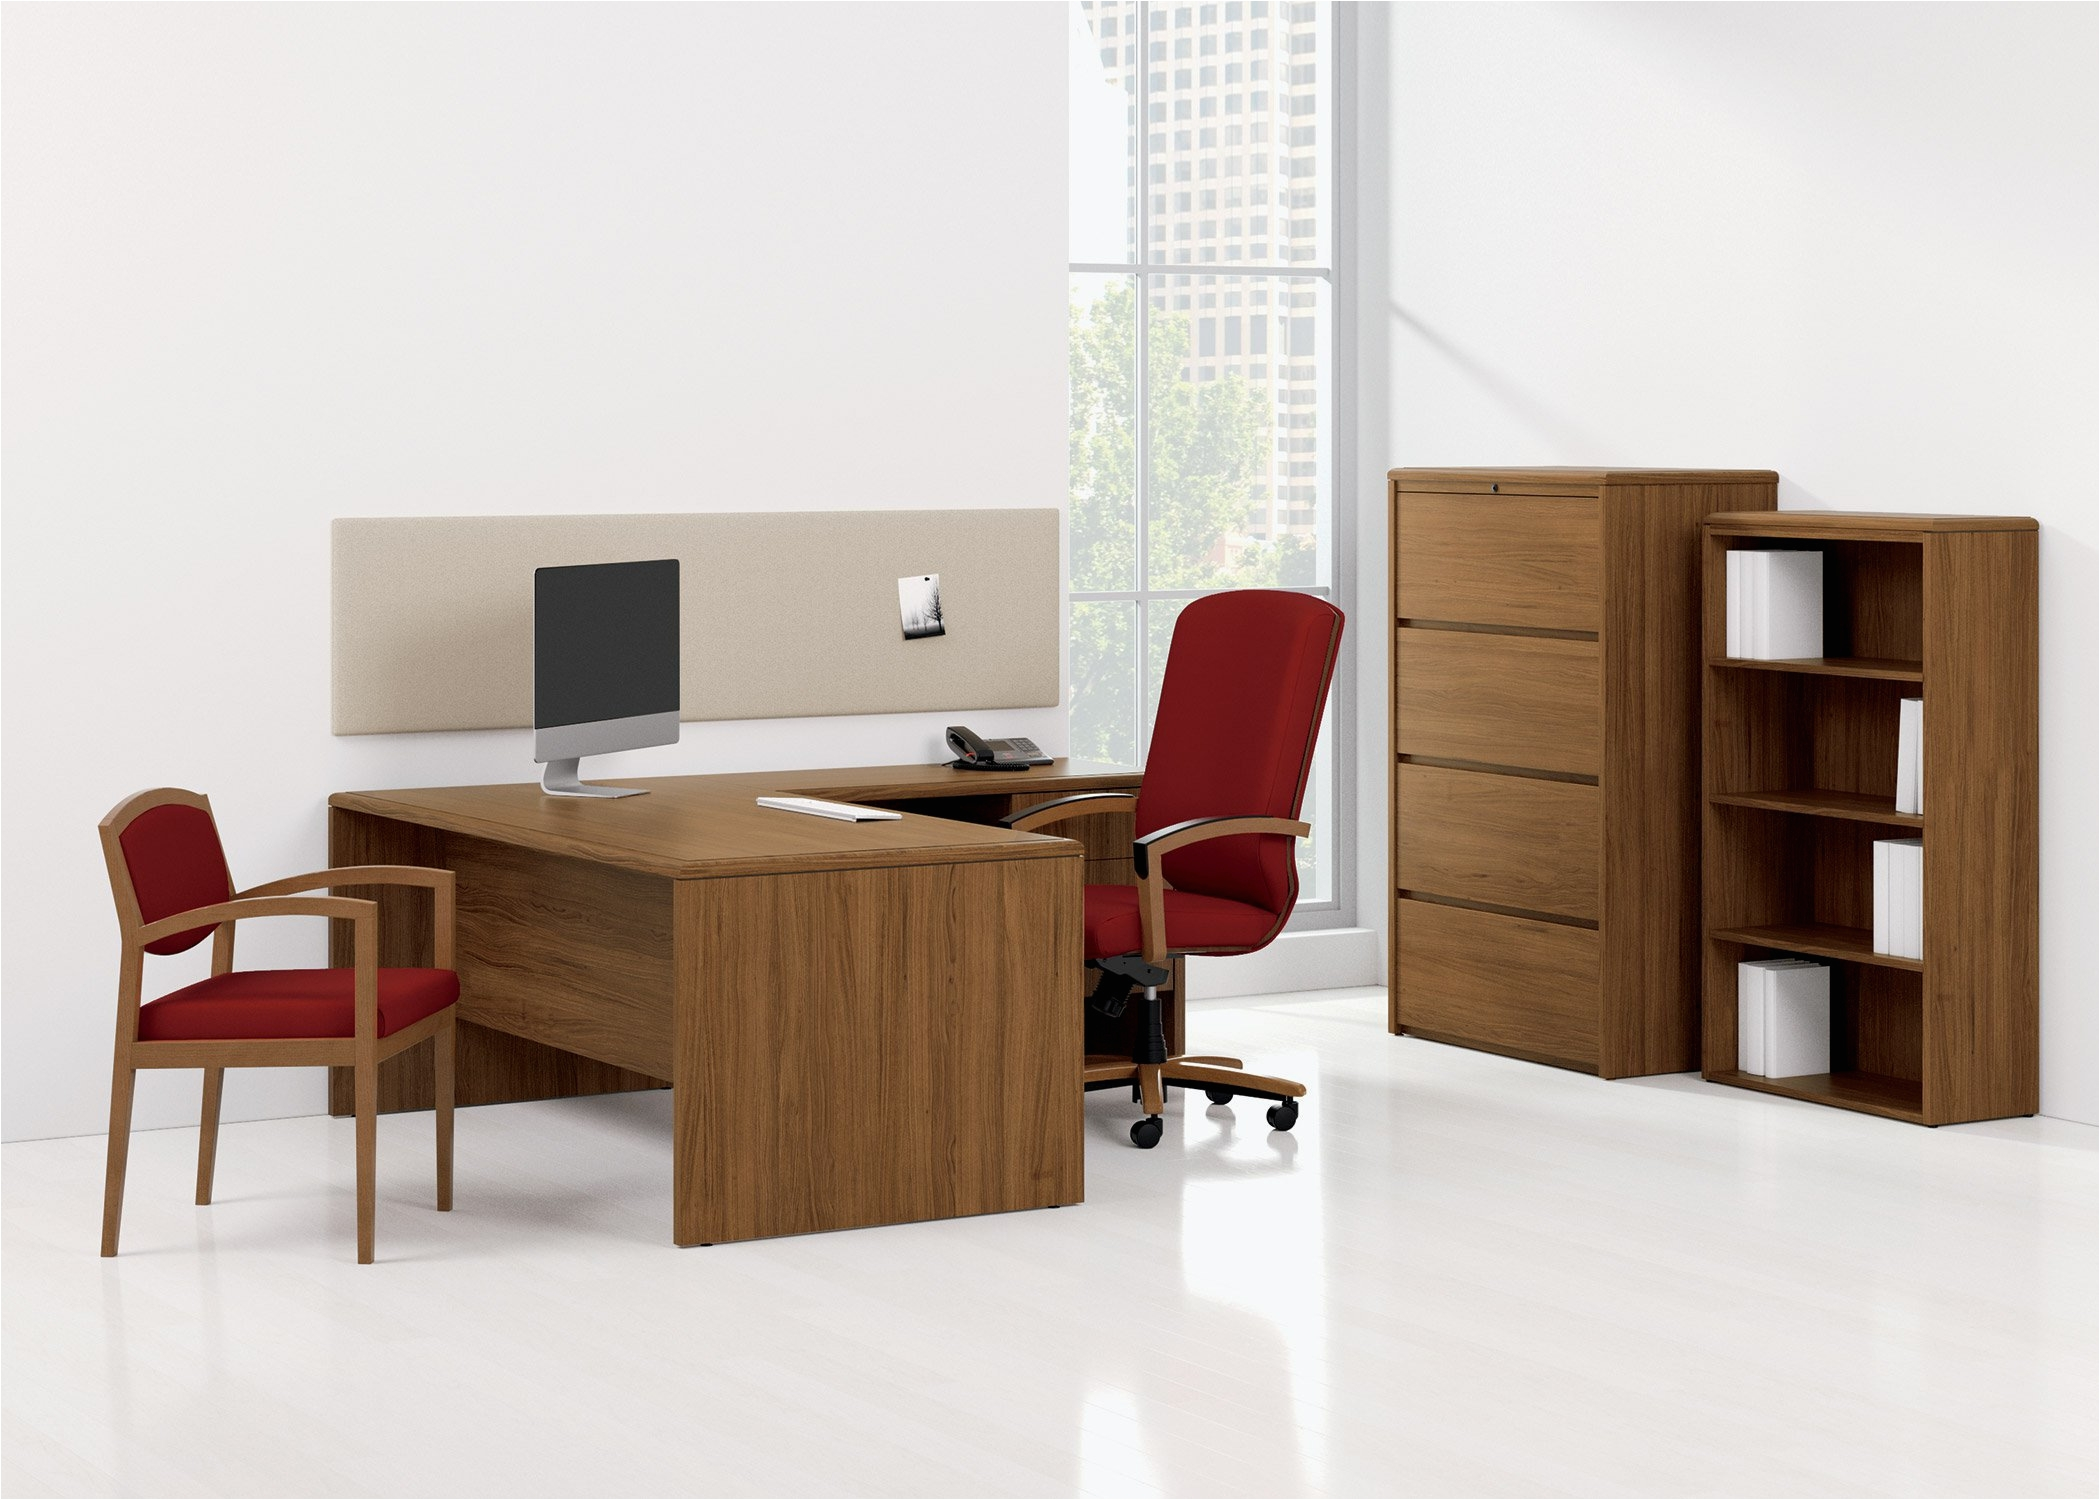 used office furniture raleigh best of home fice furniture richmond va best creative mybuddy box stock